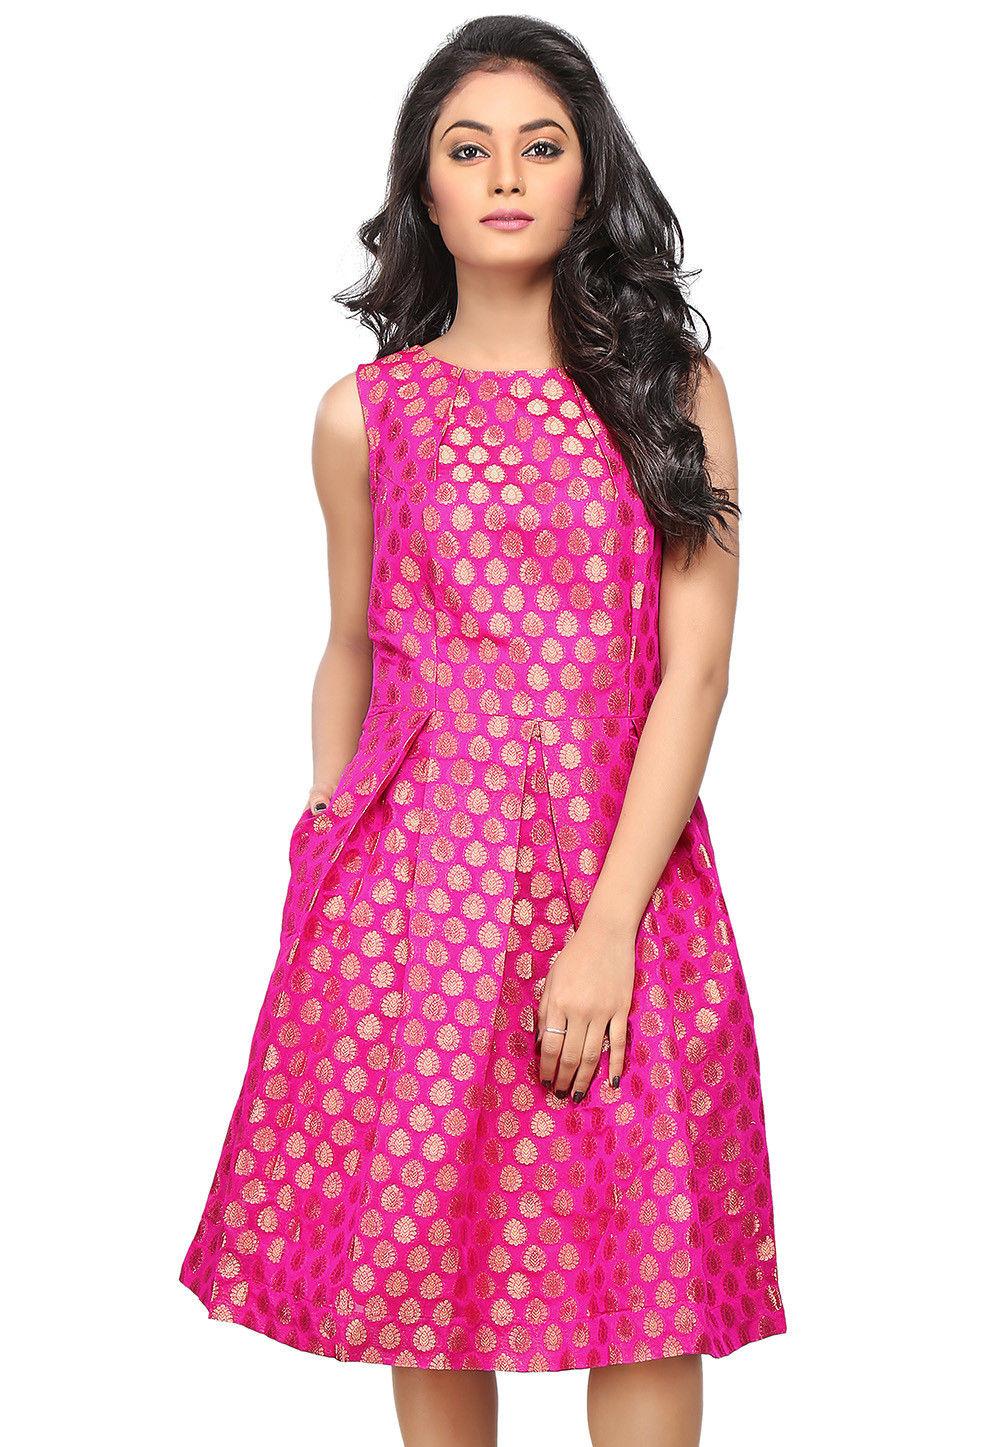 Jacquard Chanderi Silk Jacquard A Line Dress in Fuchsia